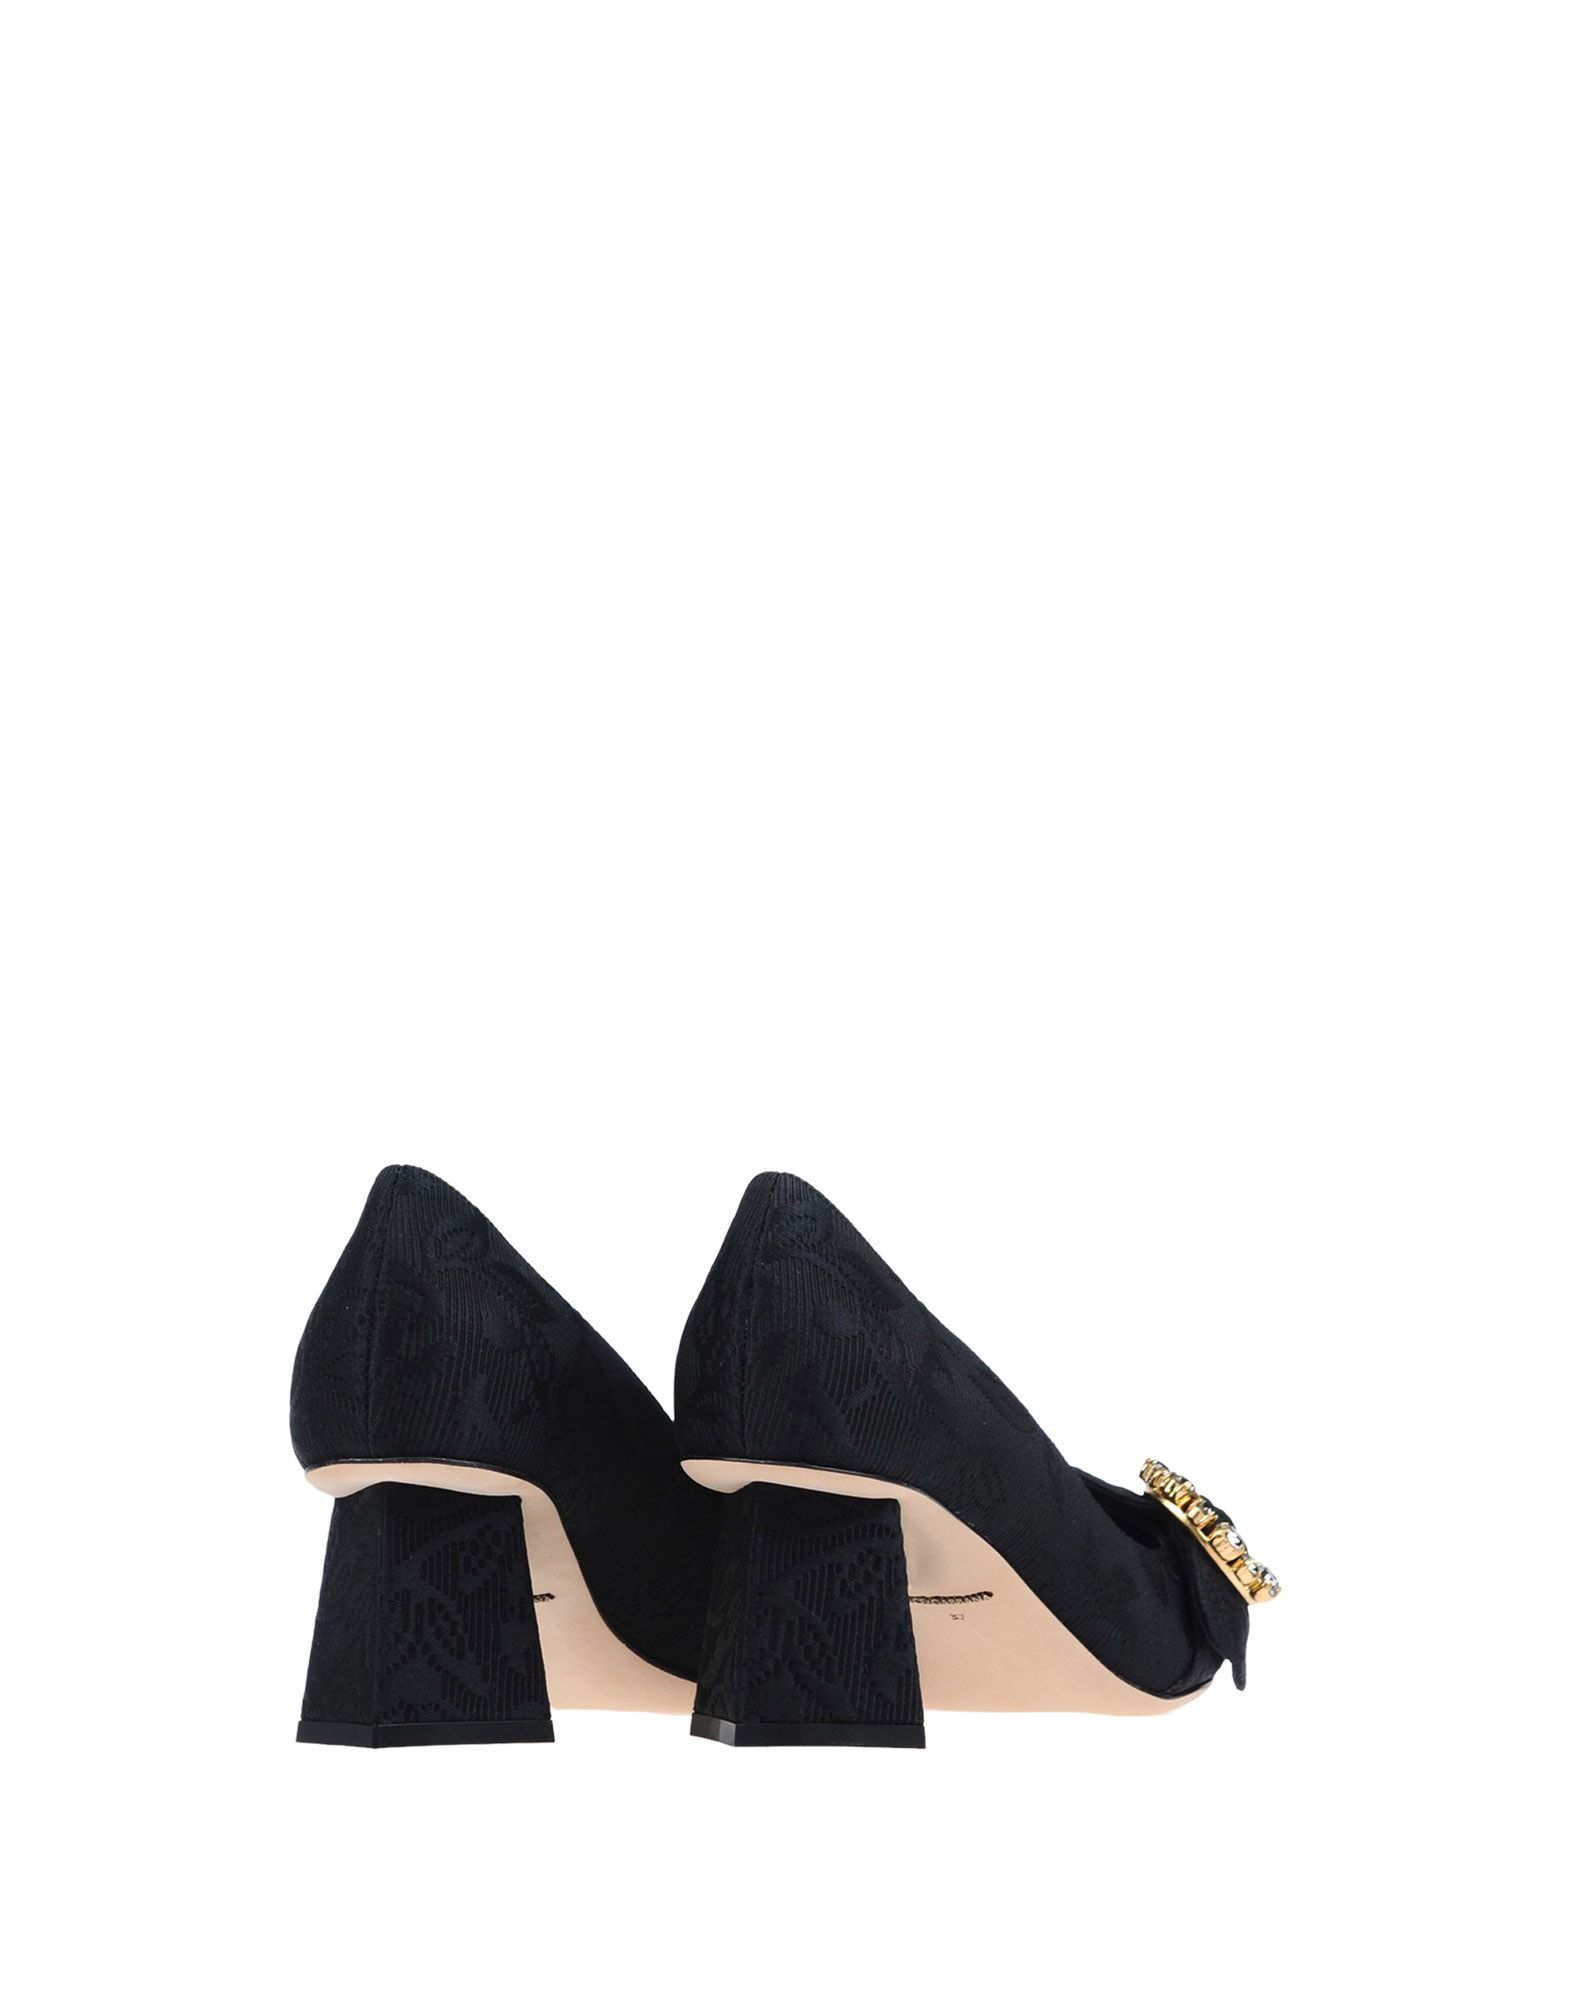 Dolce & Gabbana Pumps Damen Damen Damen  11255590TX Neue Schuhe 41e4ed